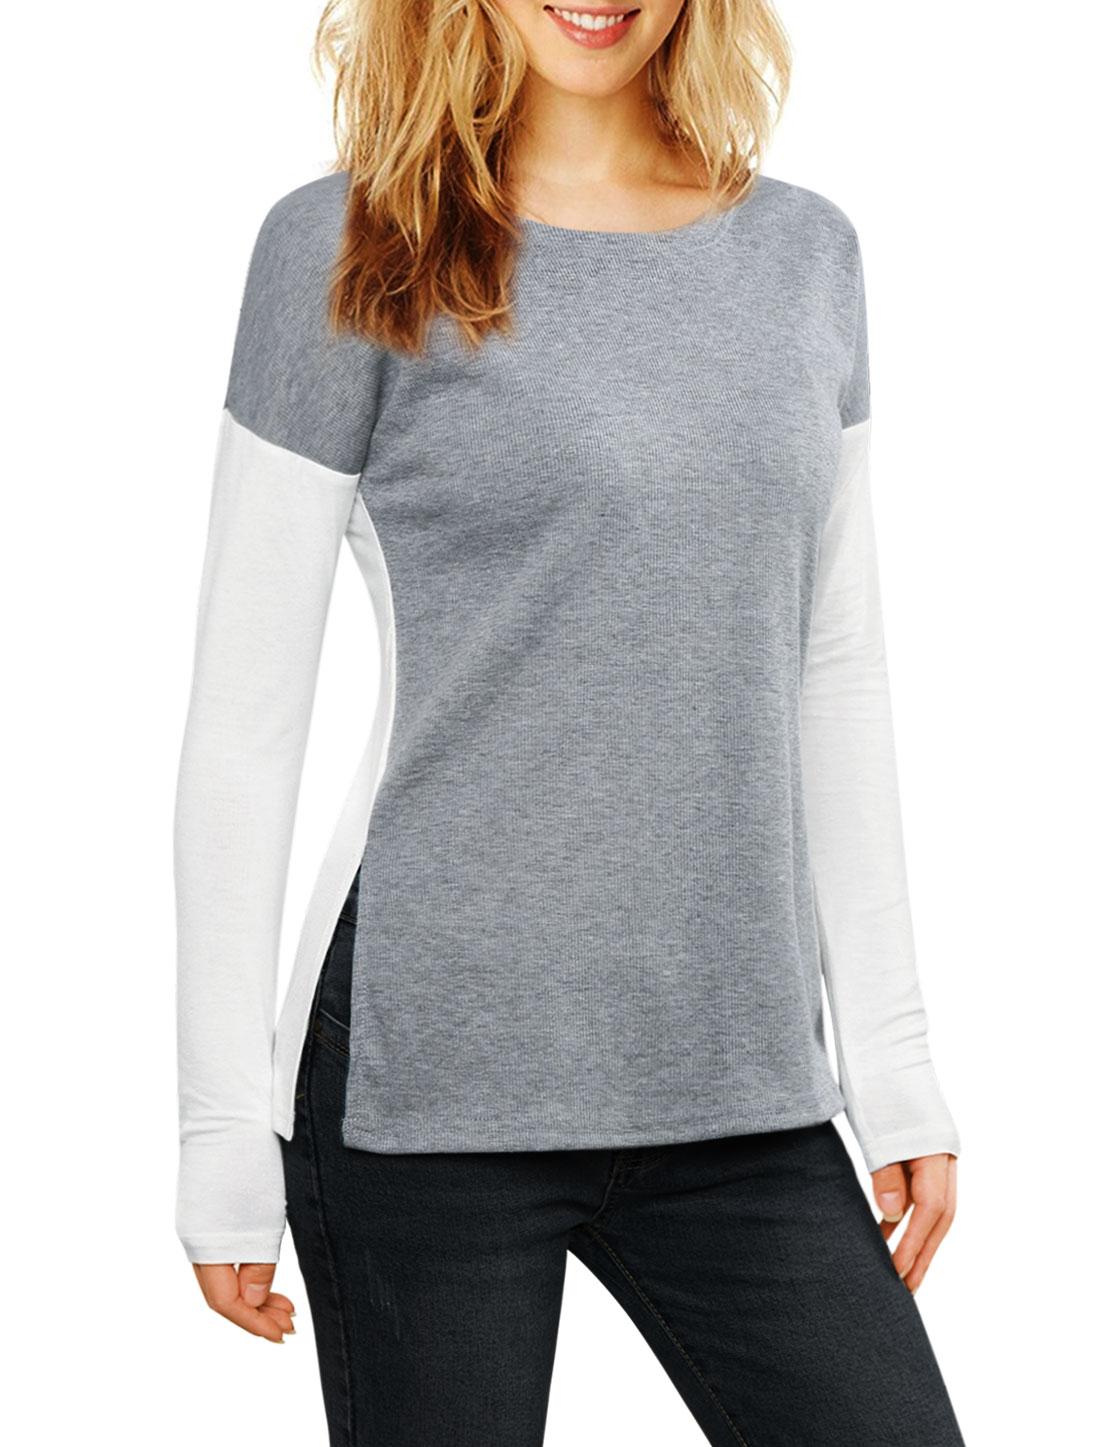 Women Color Block Side-Slit Paneled Slim Fit Ribbed Top Gray M